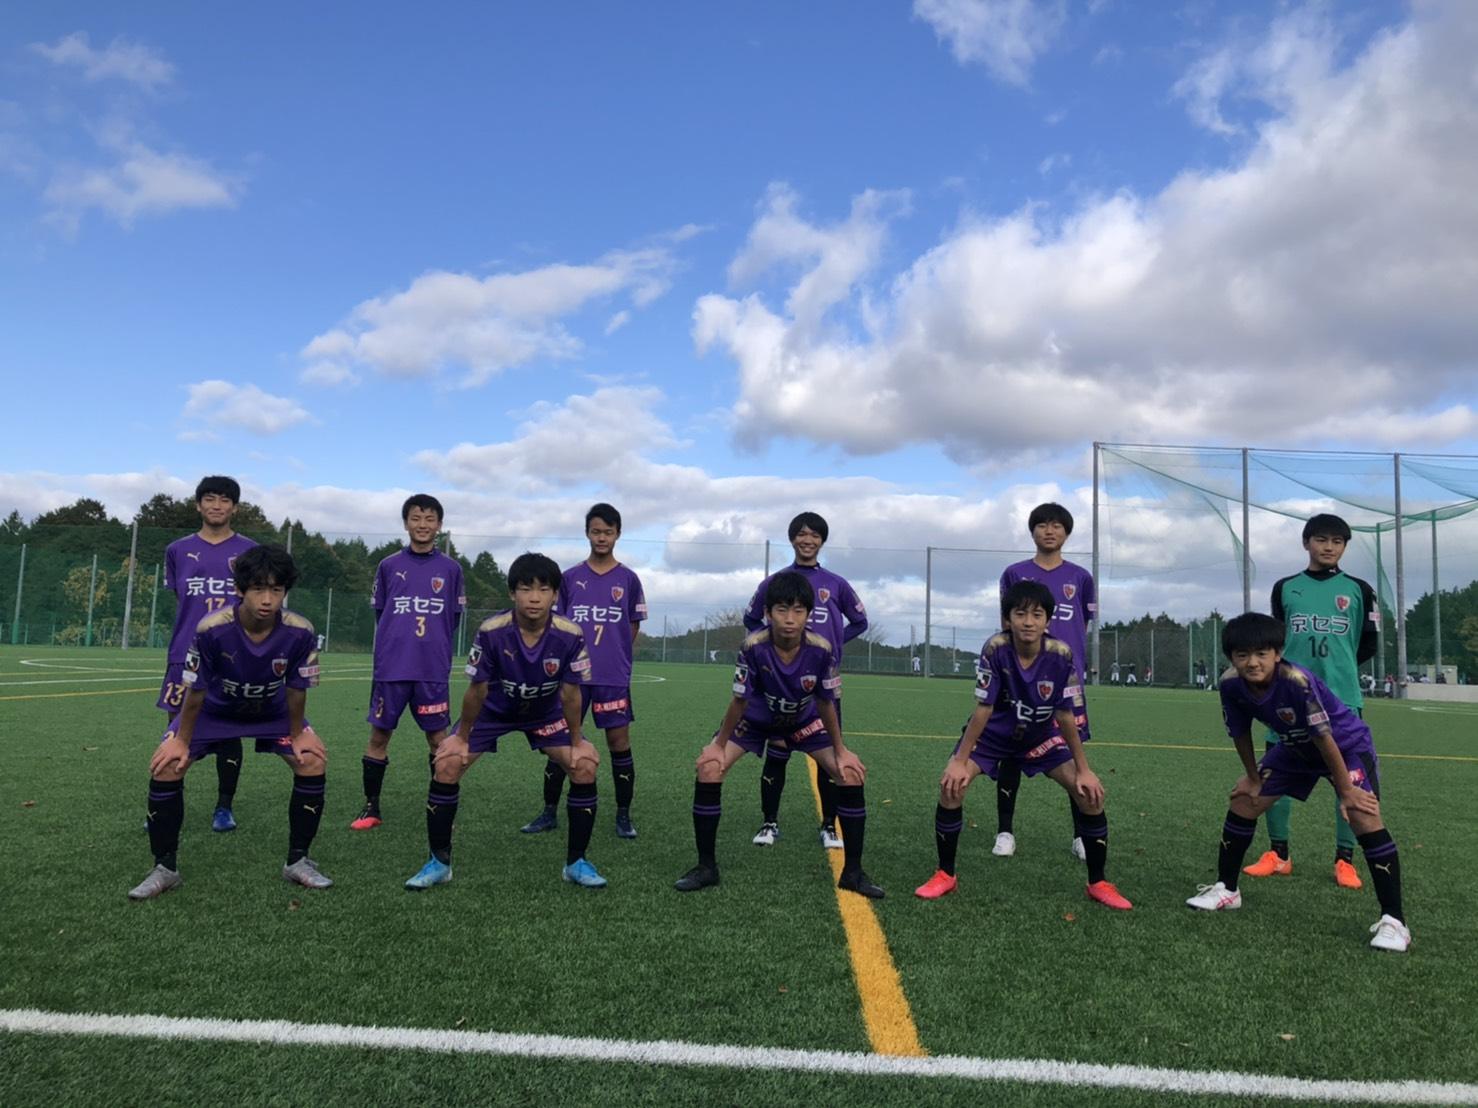 【U-14】クラブユース新人戦Semi Final